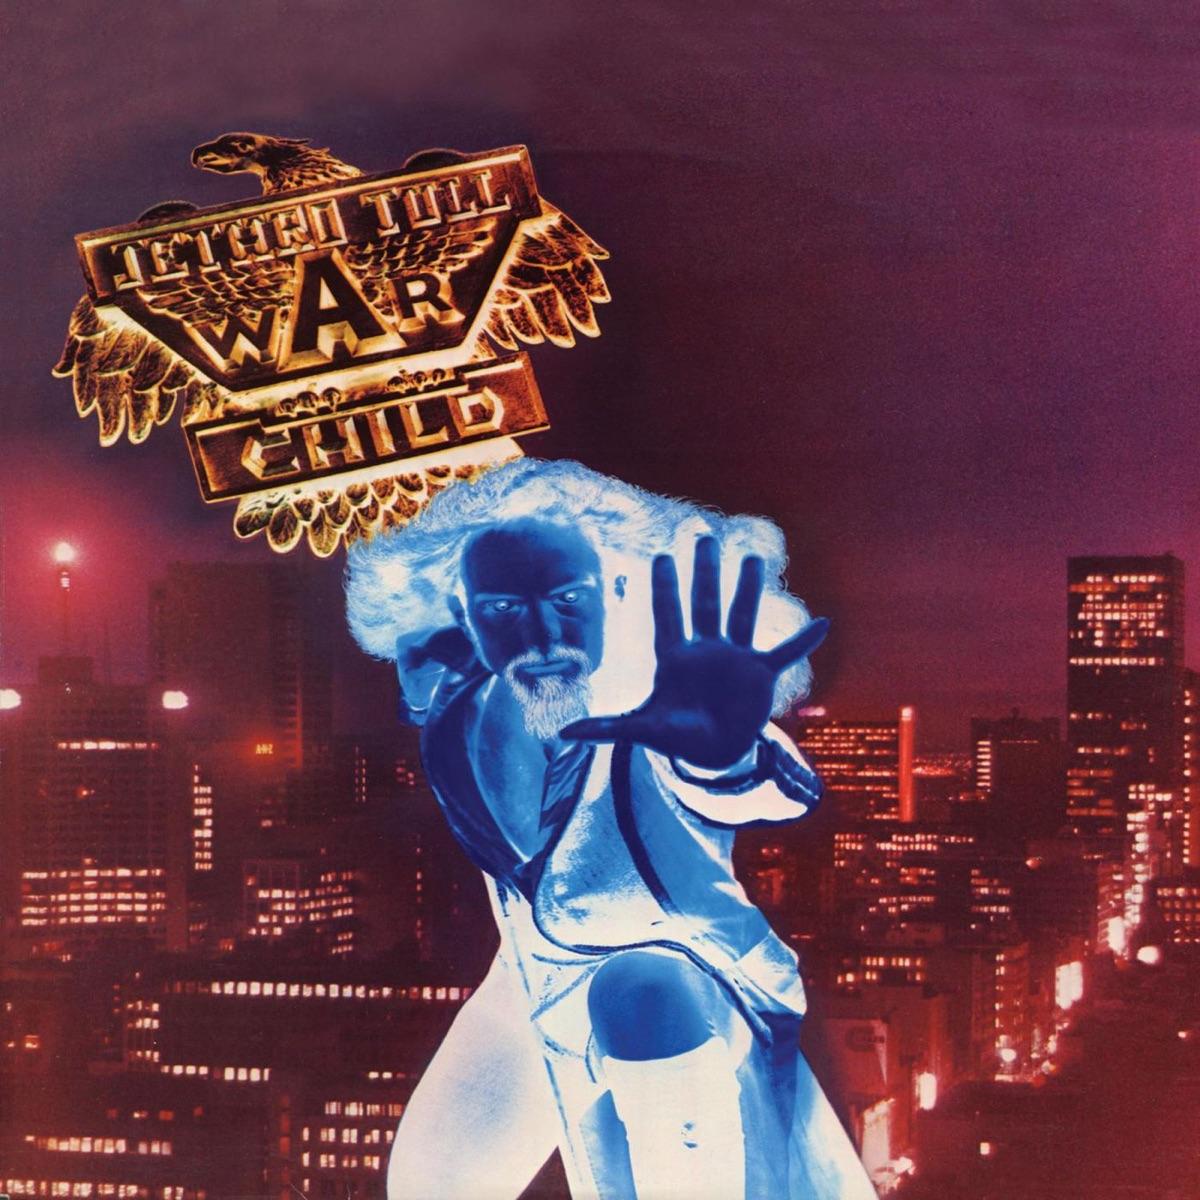 War Child Album Cover by Jethro Tull